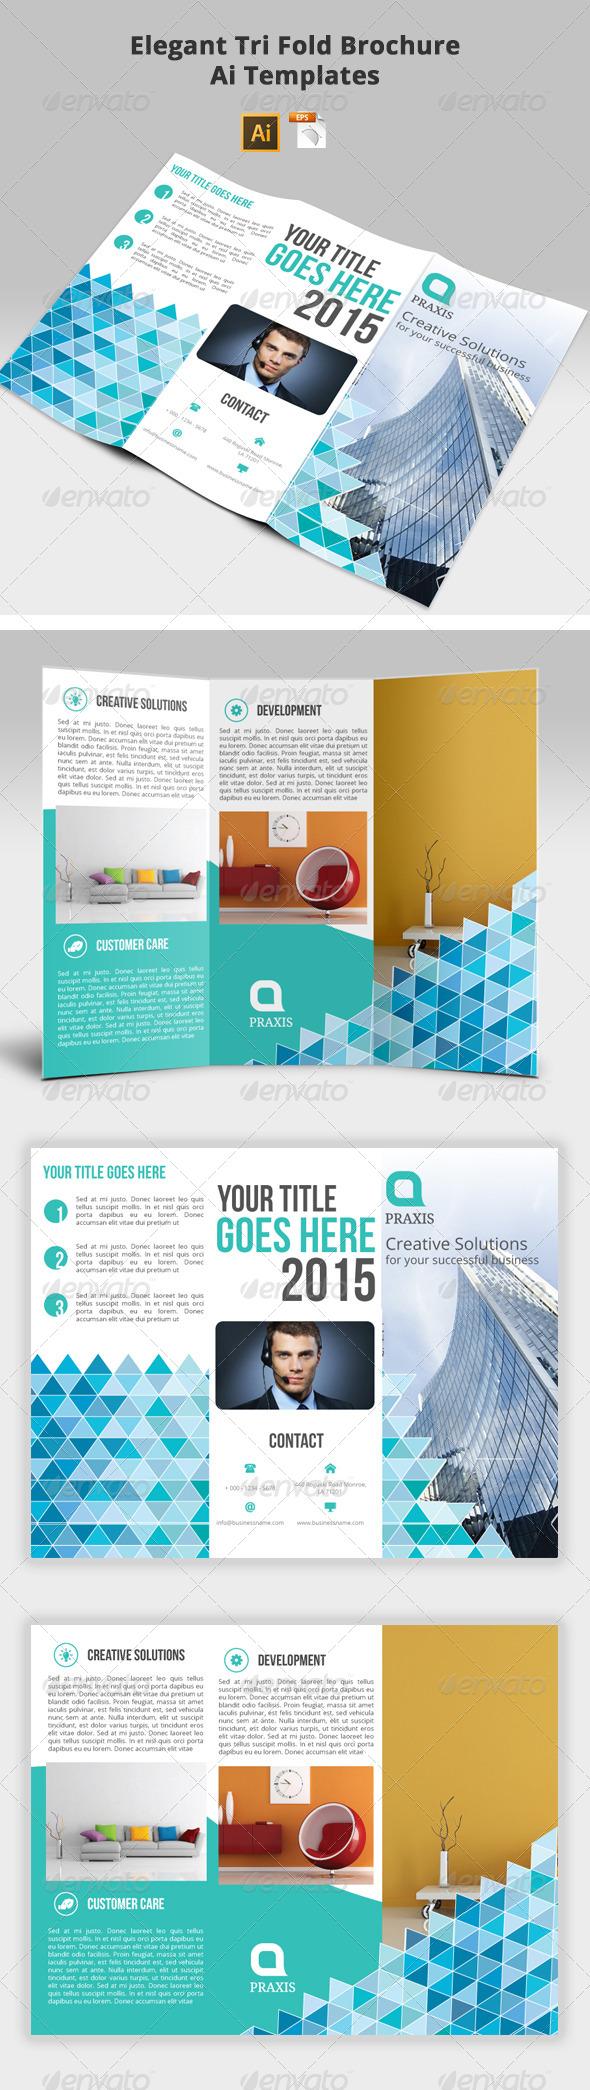 Elegant Tri-Fold Brochure Ai Templates - Brochures Print Templates